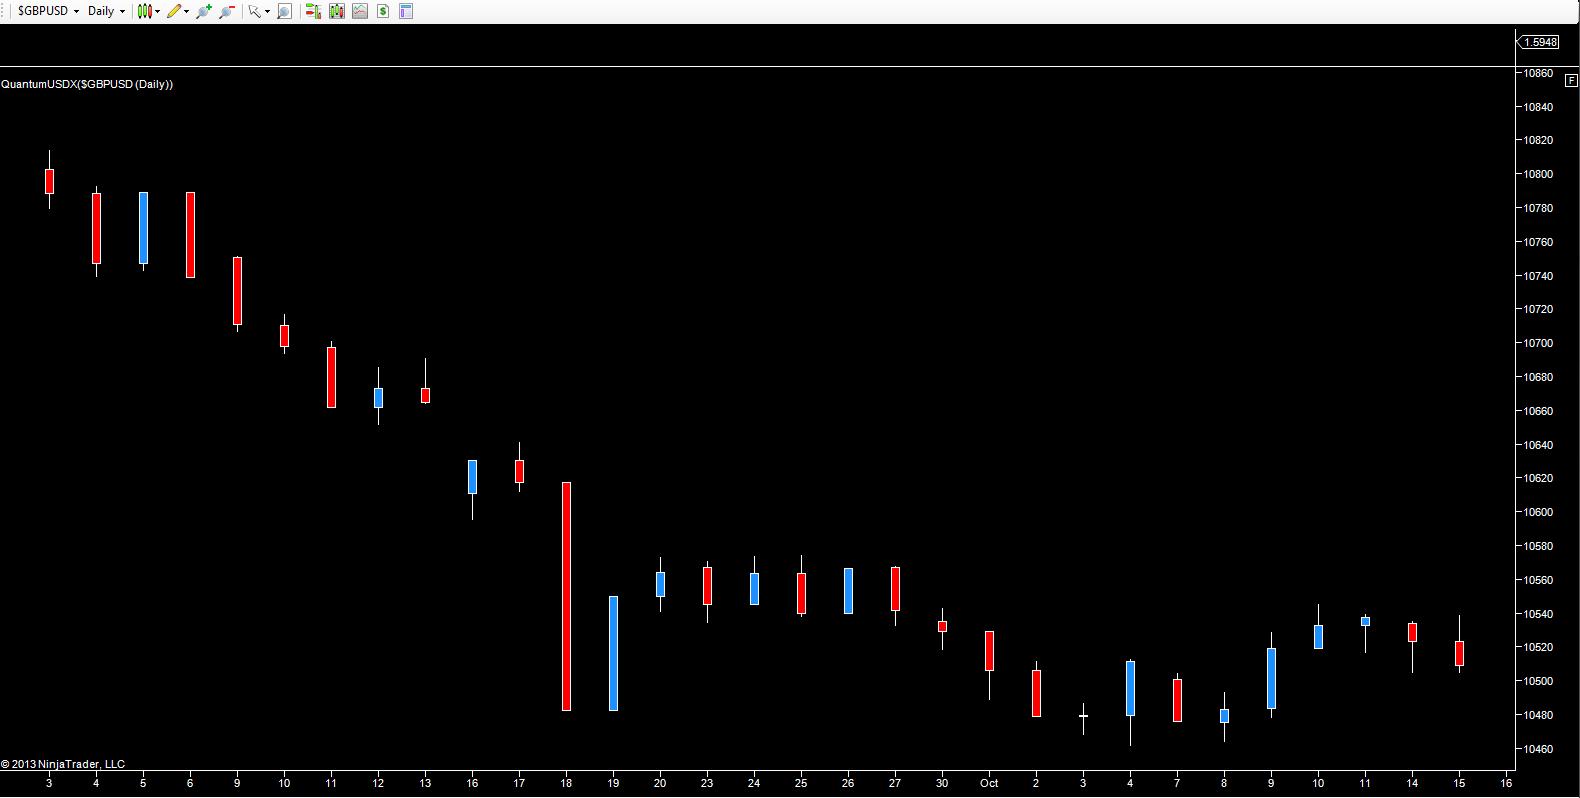 DJFXCM - US dollar index daily chart